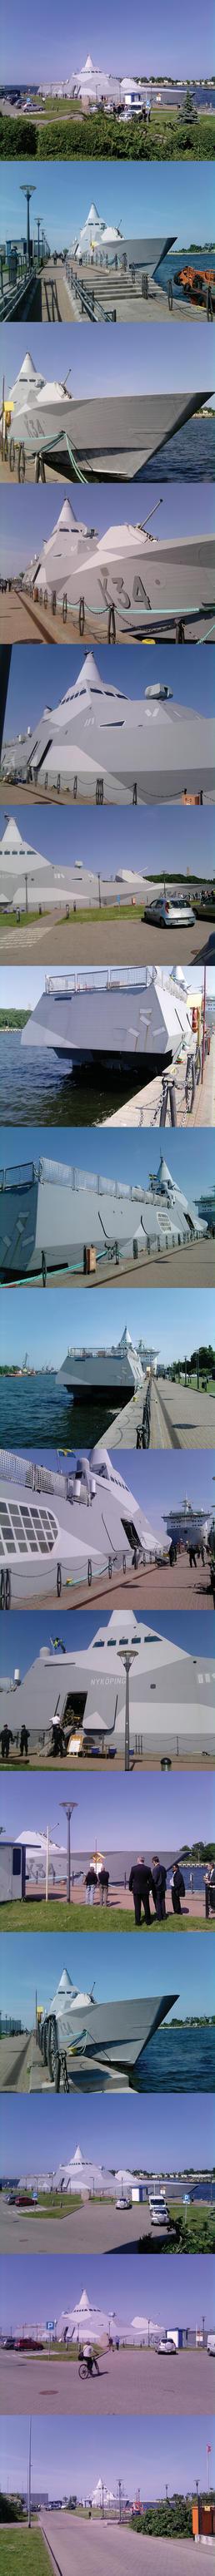 HSwMS Nykoping by zaku1986